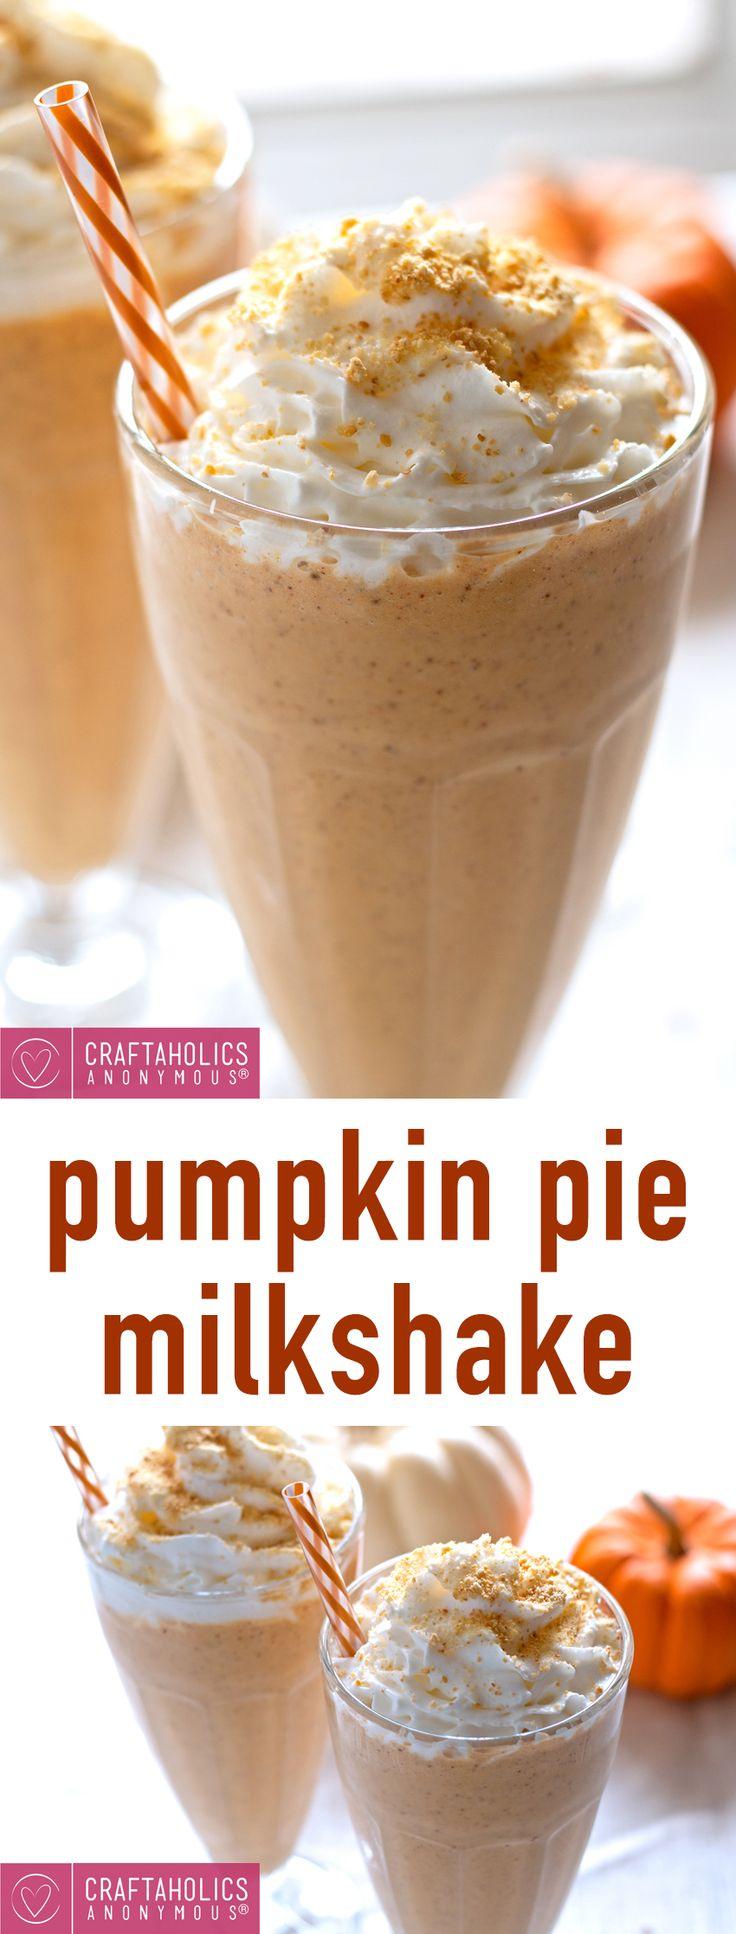 How to make Pumpkin Pie Milkshake recipe || Yummy fall dessert that is sure to please!